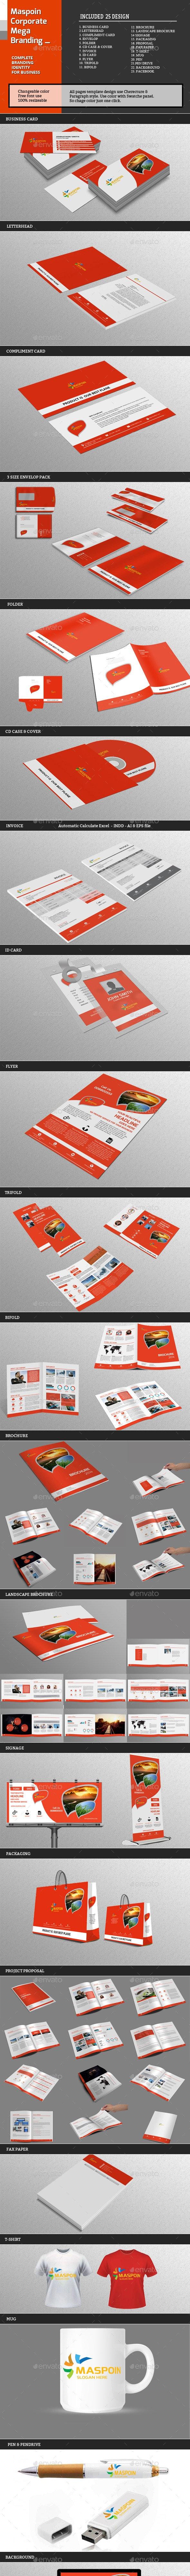 Maspoin Corporate Mega Branding - Stationery Print Templates